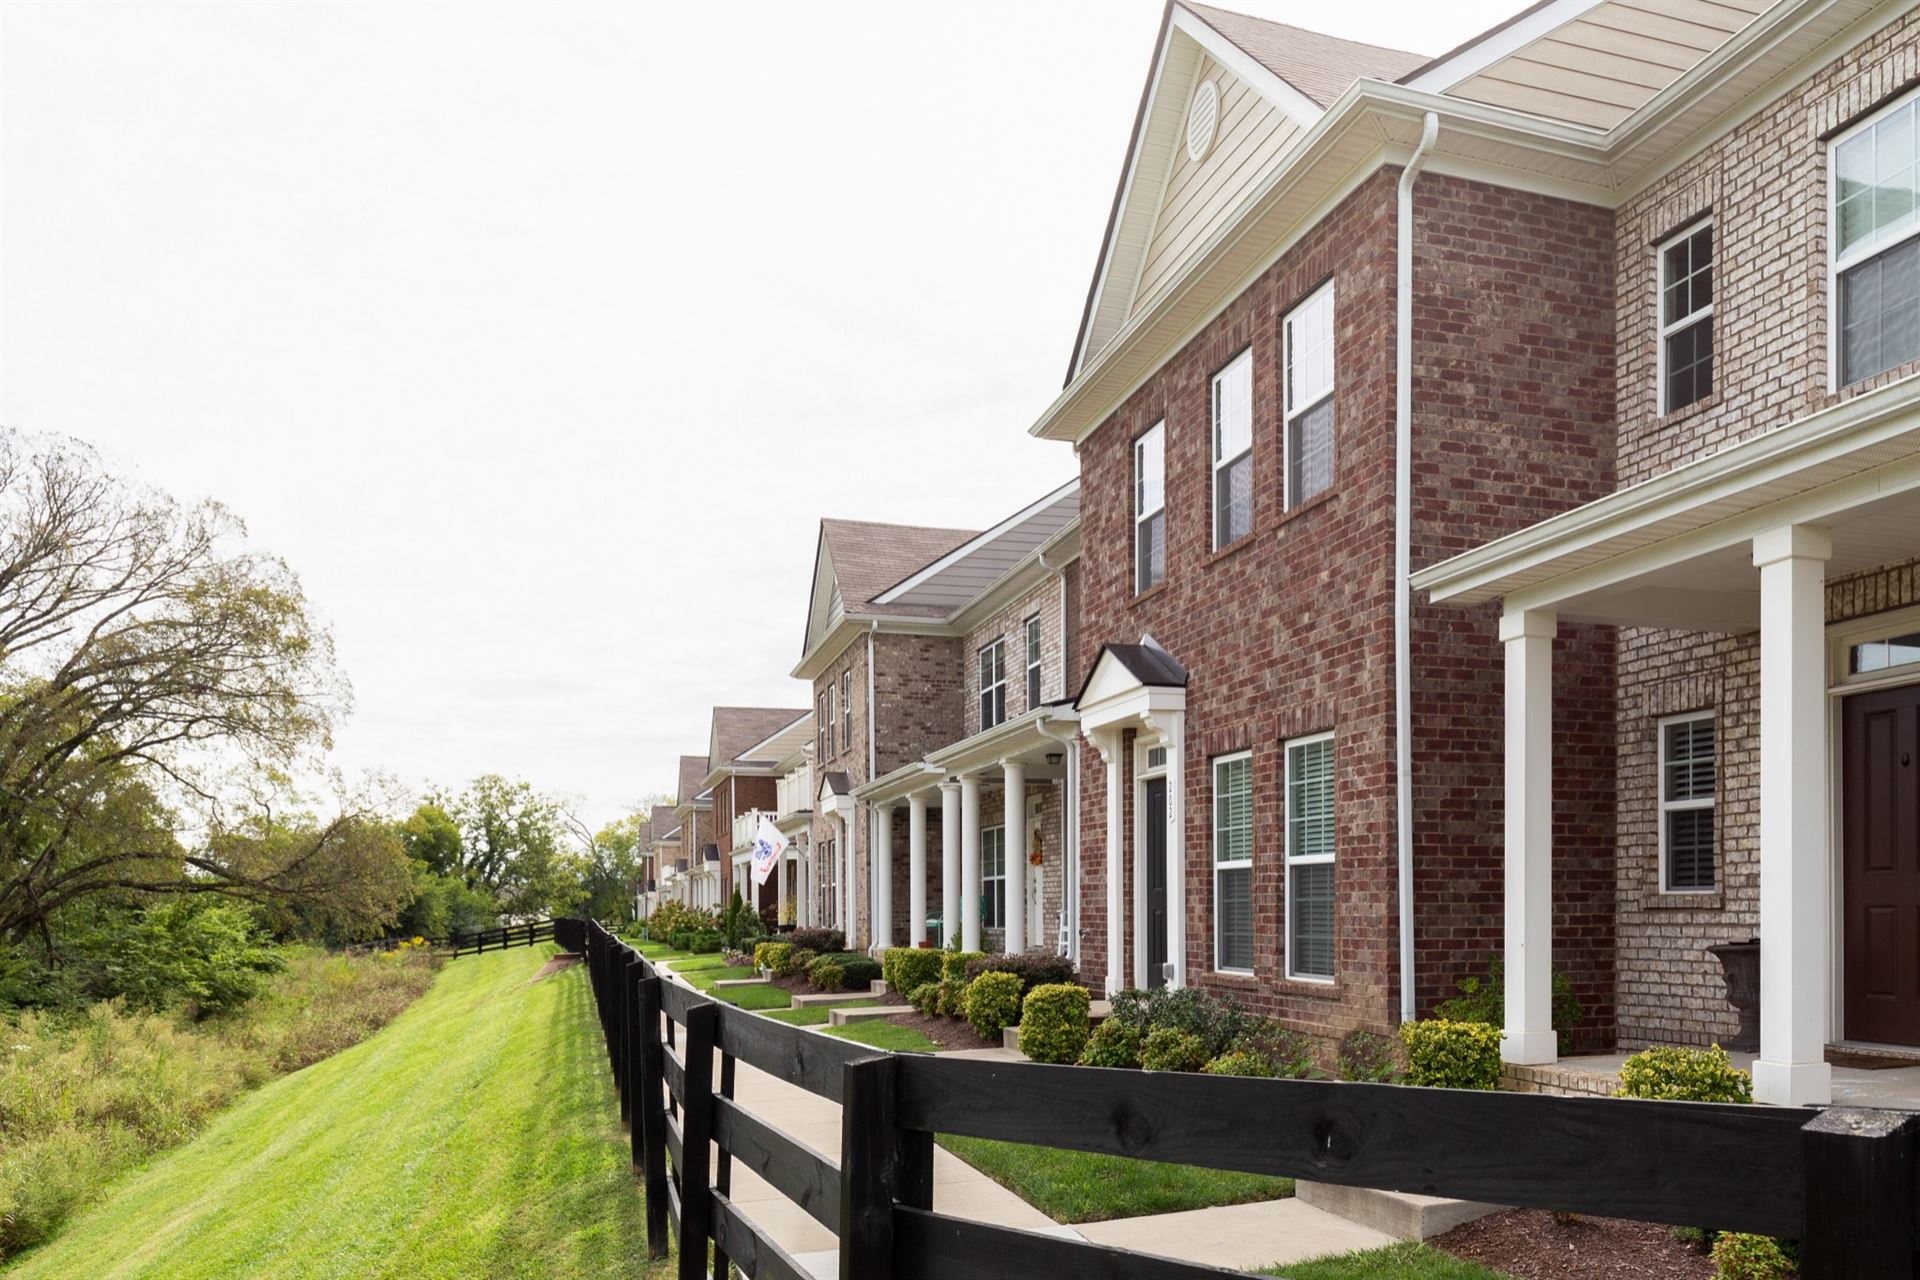 Photo of 202 Oldbury Ln, Spring Hill, TN 37174 (MLS # 2190364)